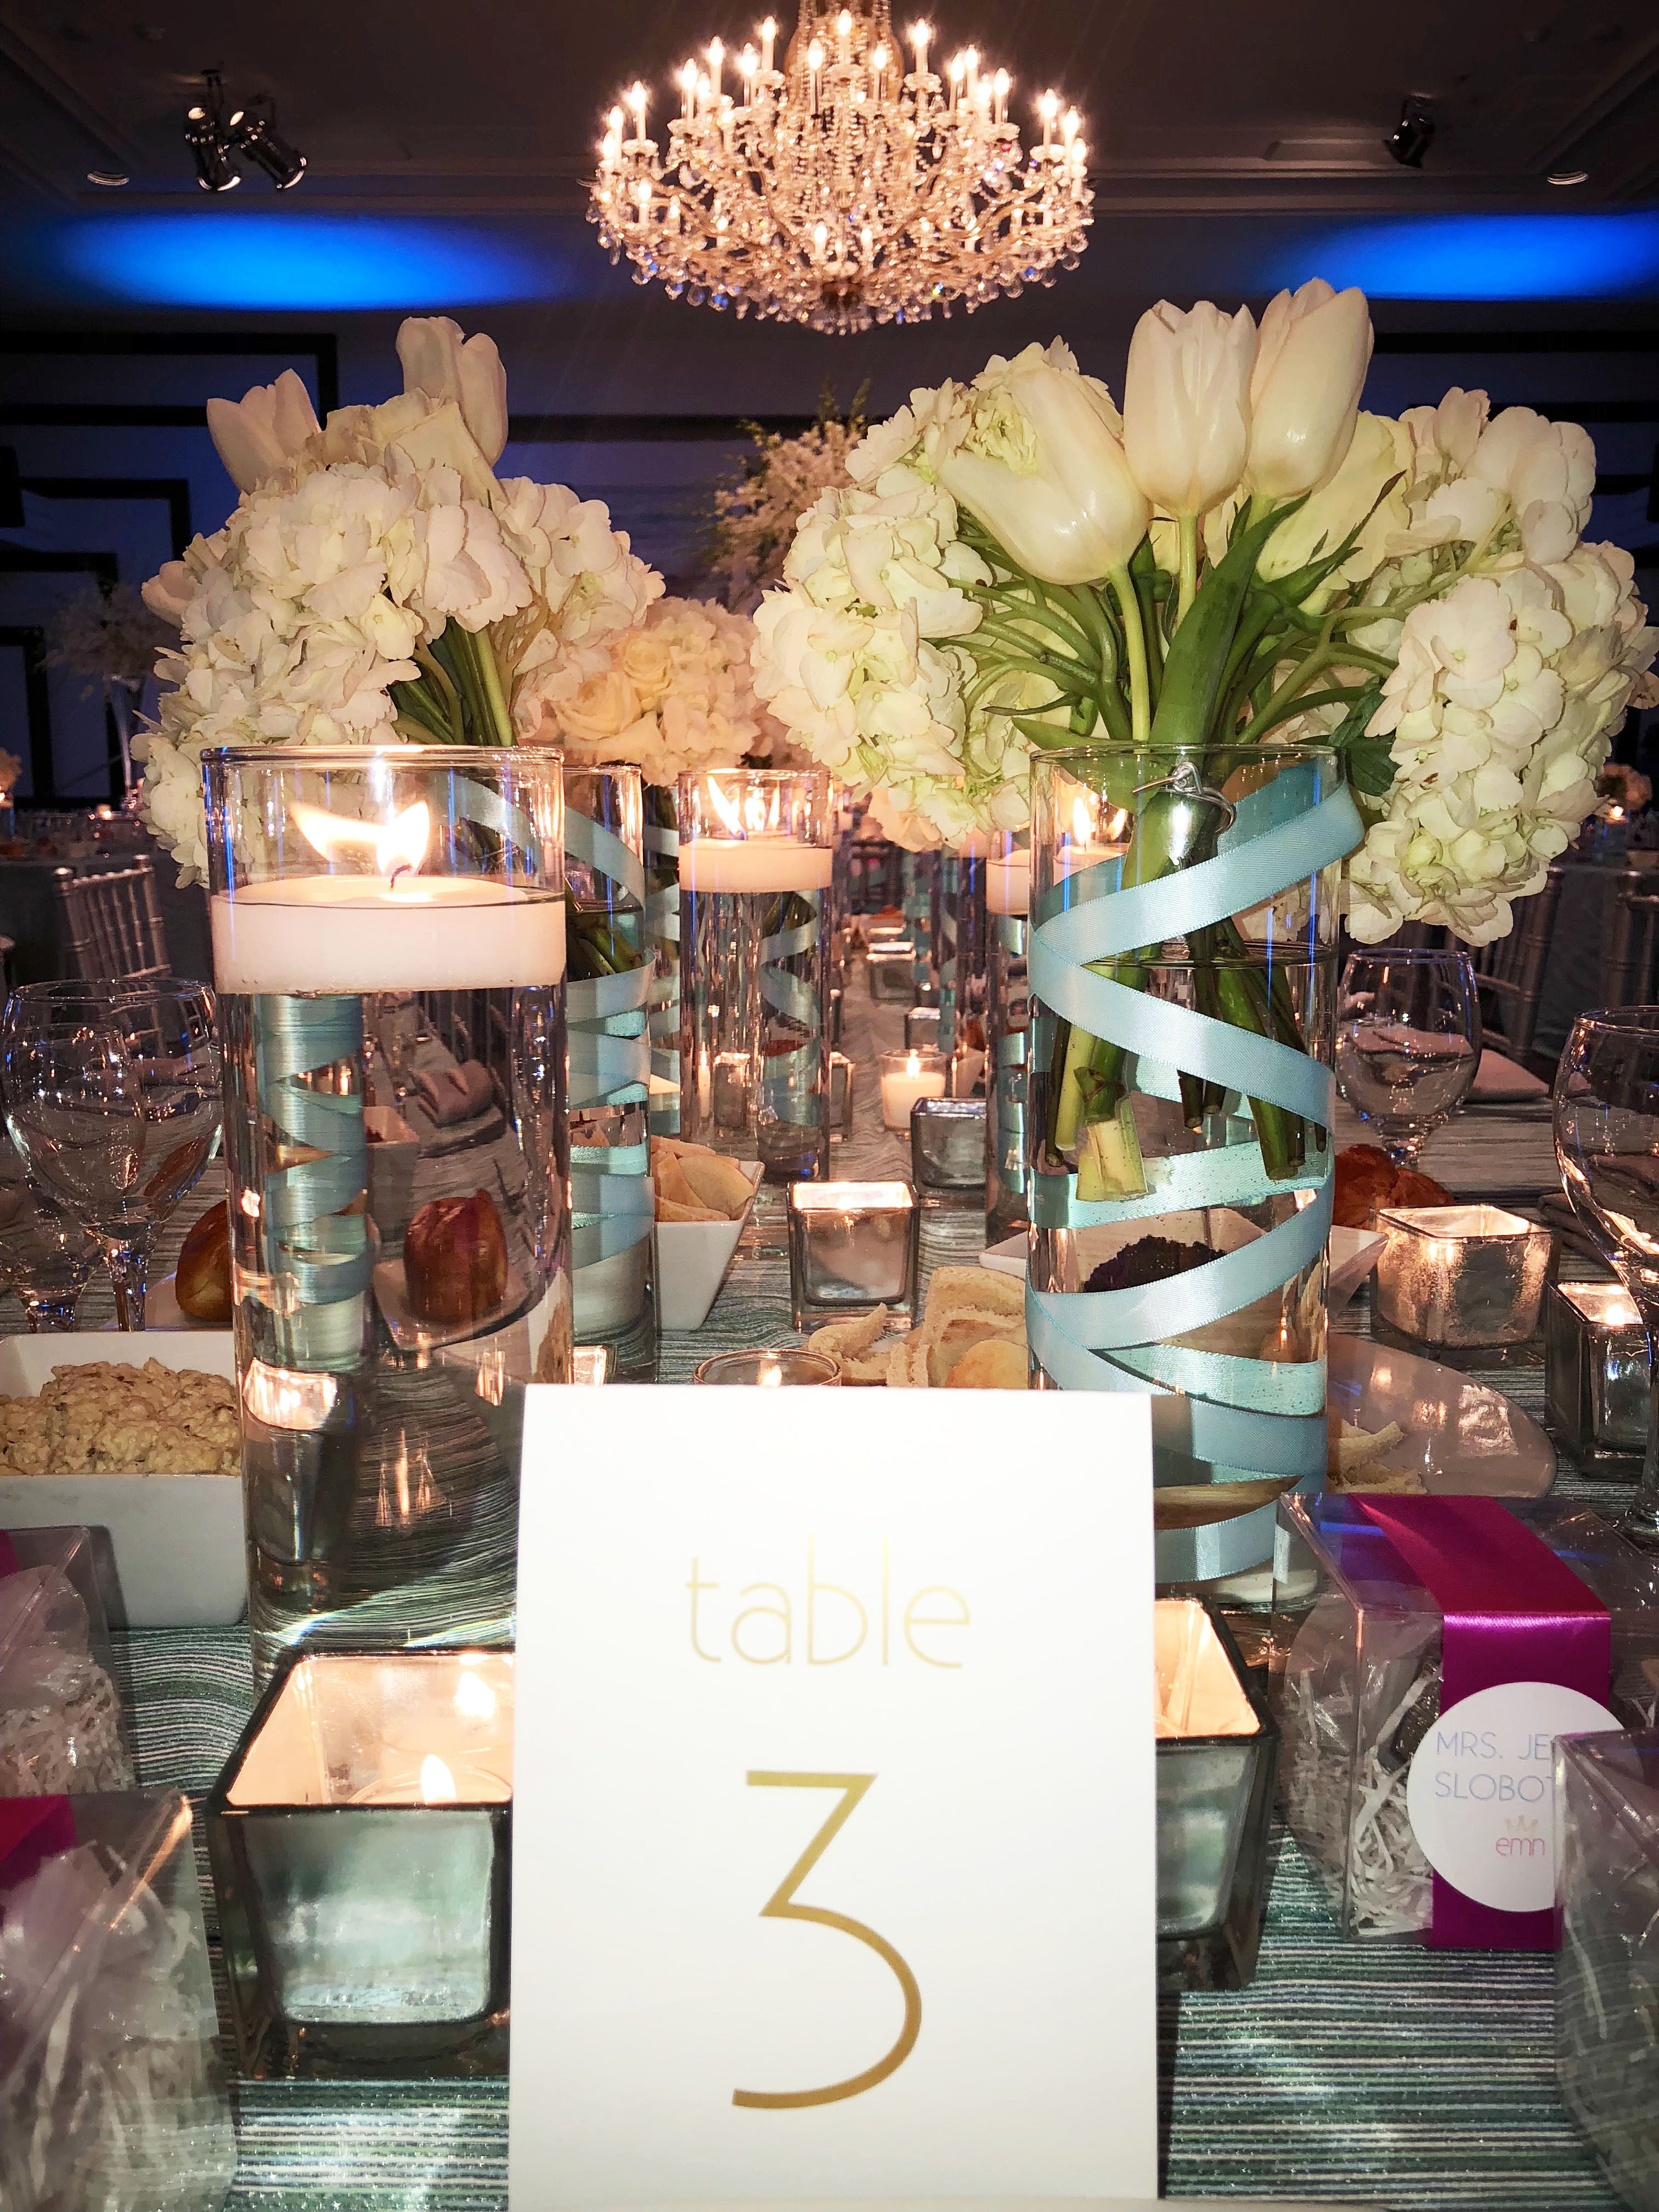 Chris Weinberg Events Dinner Party Shabbat Ideas Venue Miami Beach